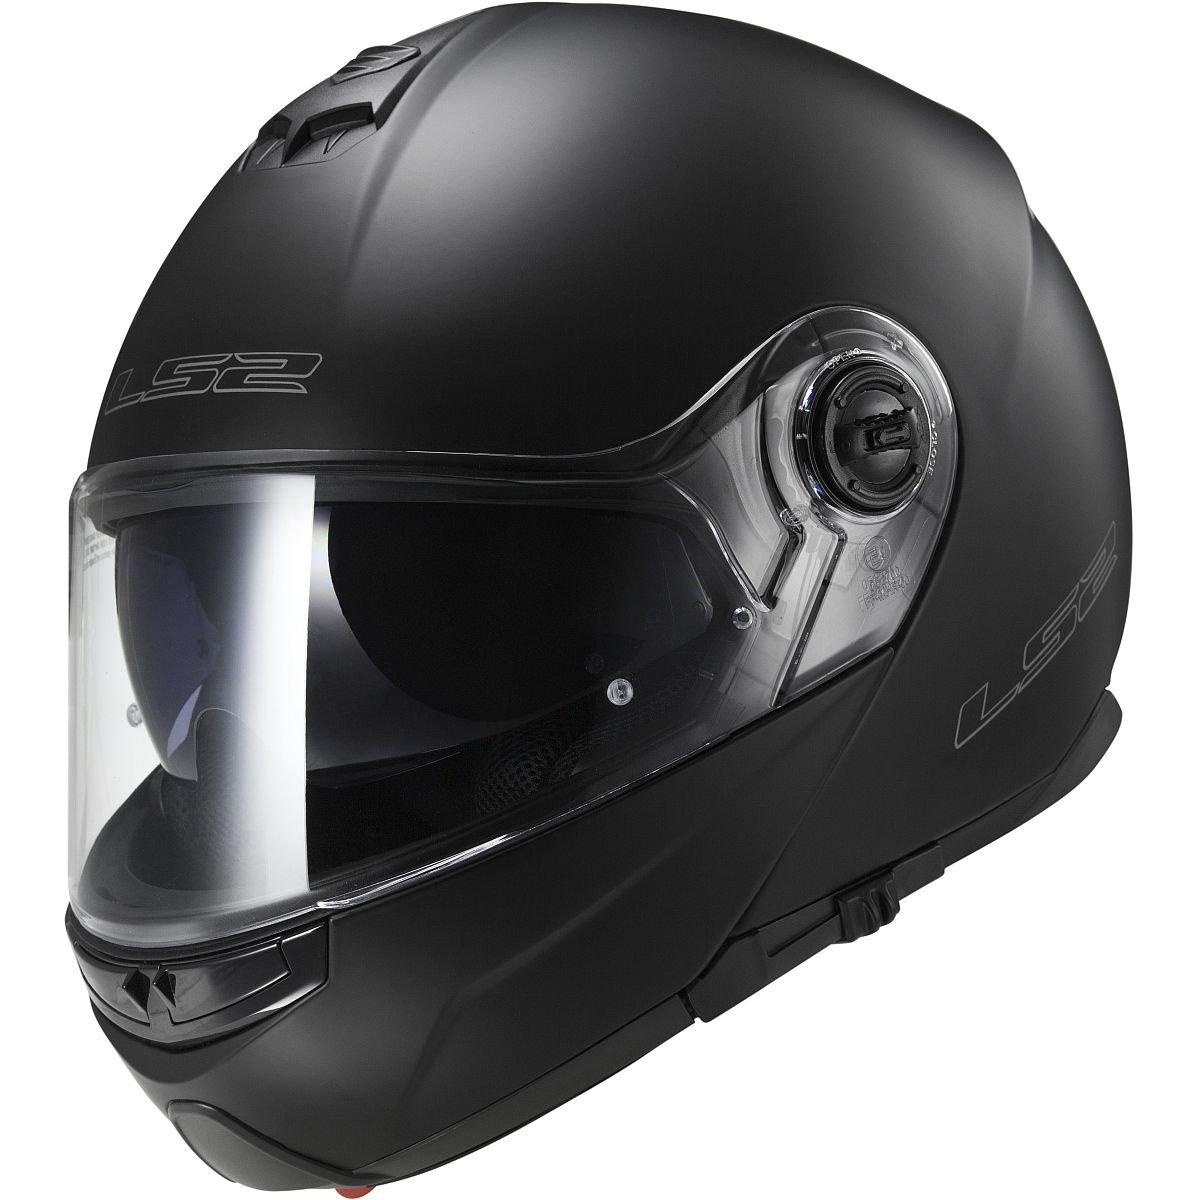 LS2 Helmets Strobe Solid Modular Motorcycle Helmet with Sunshield (Matte Black, Medium) by LS2 Helmets